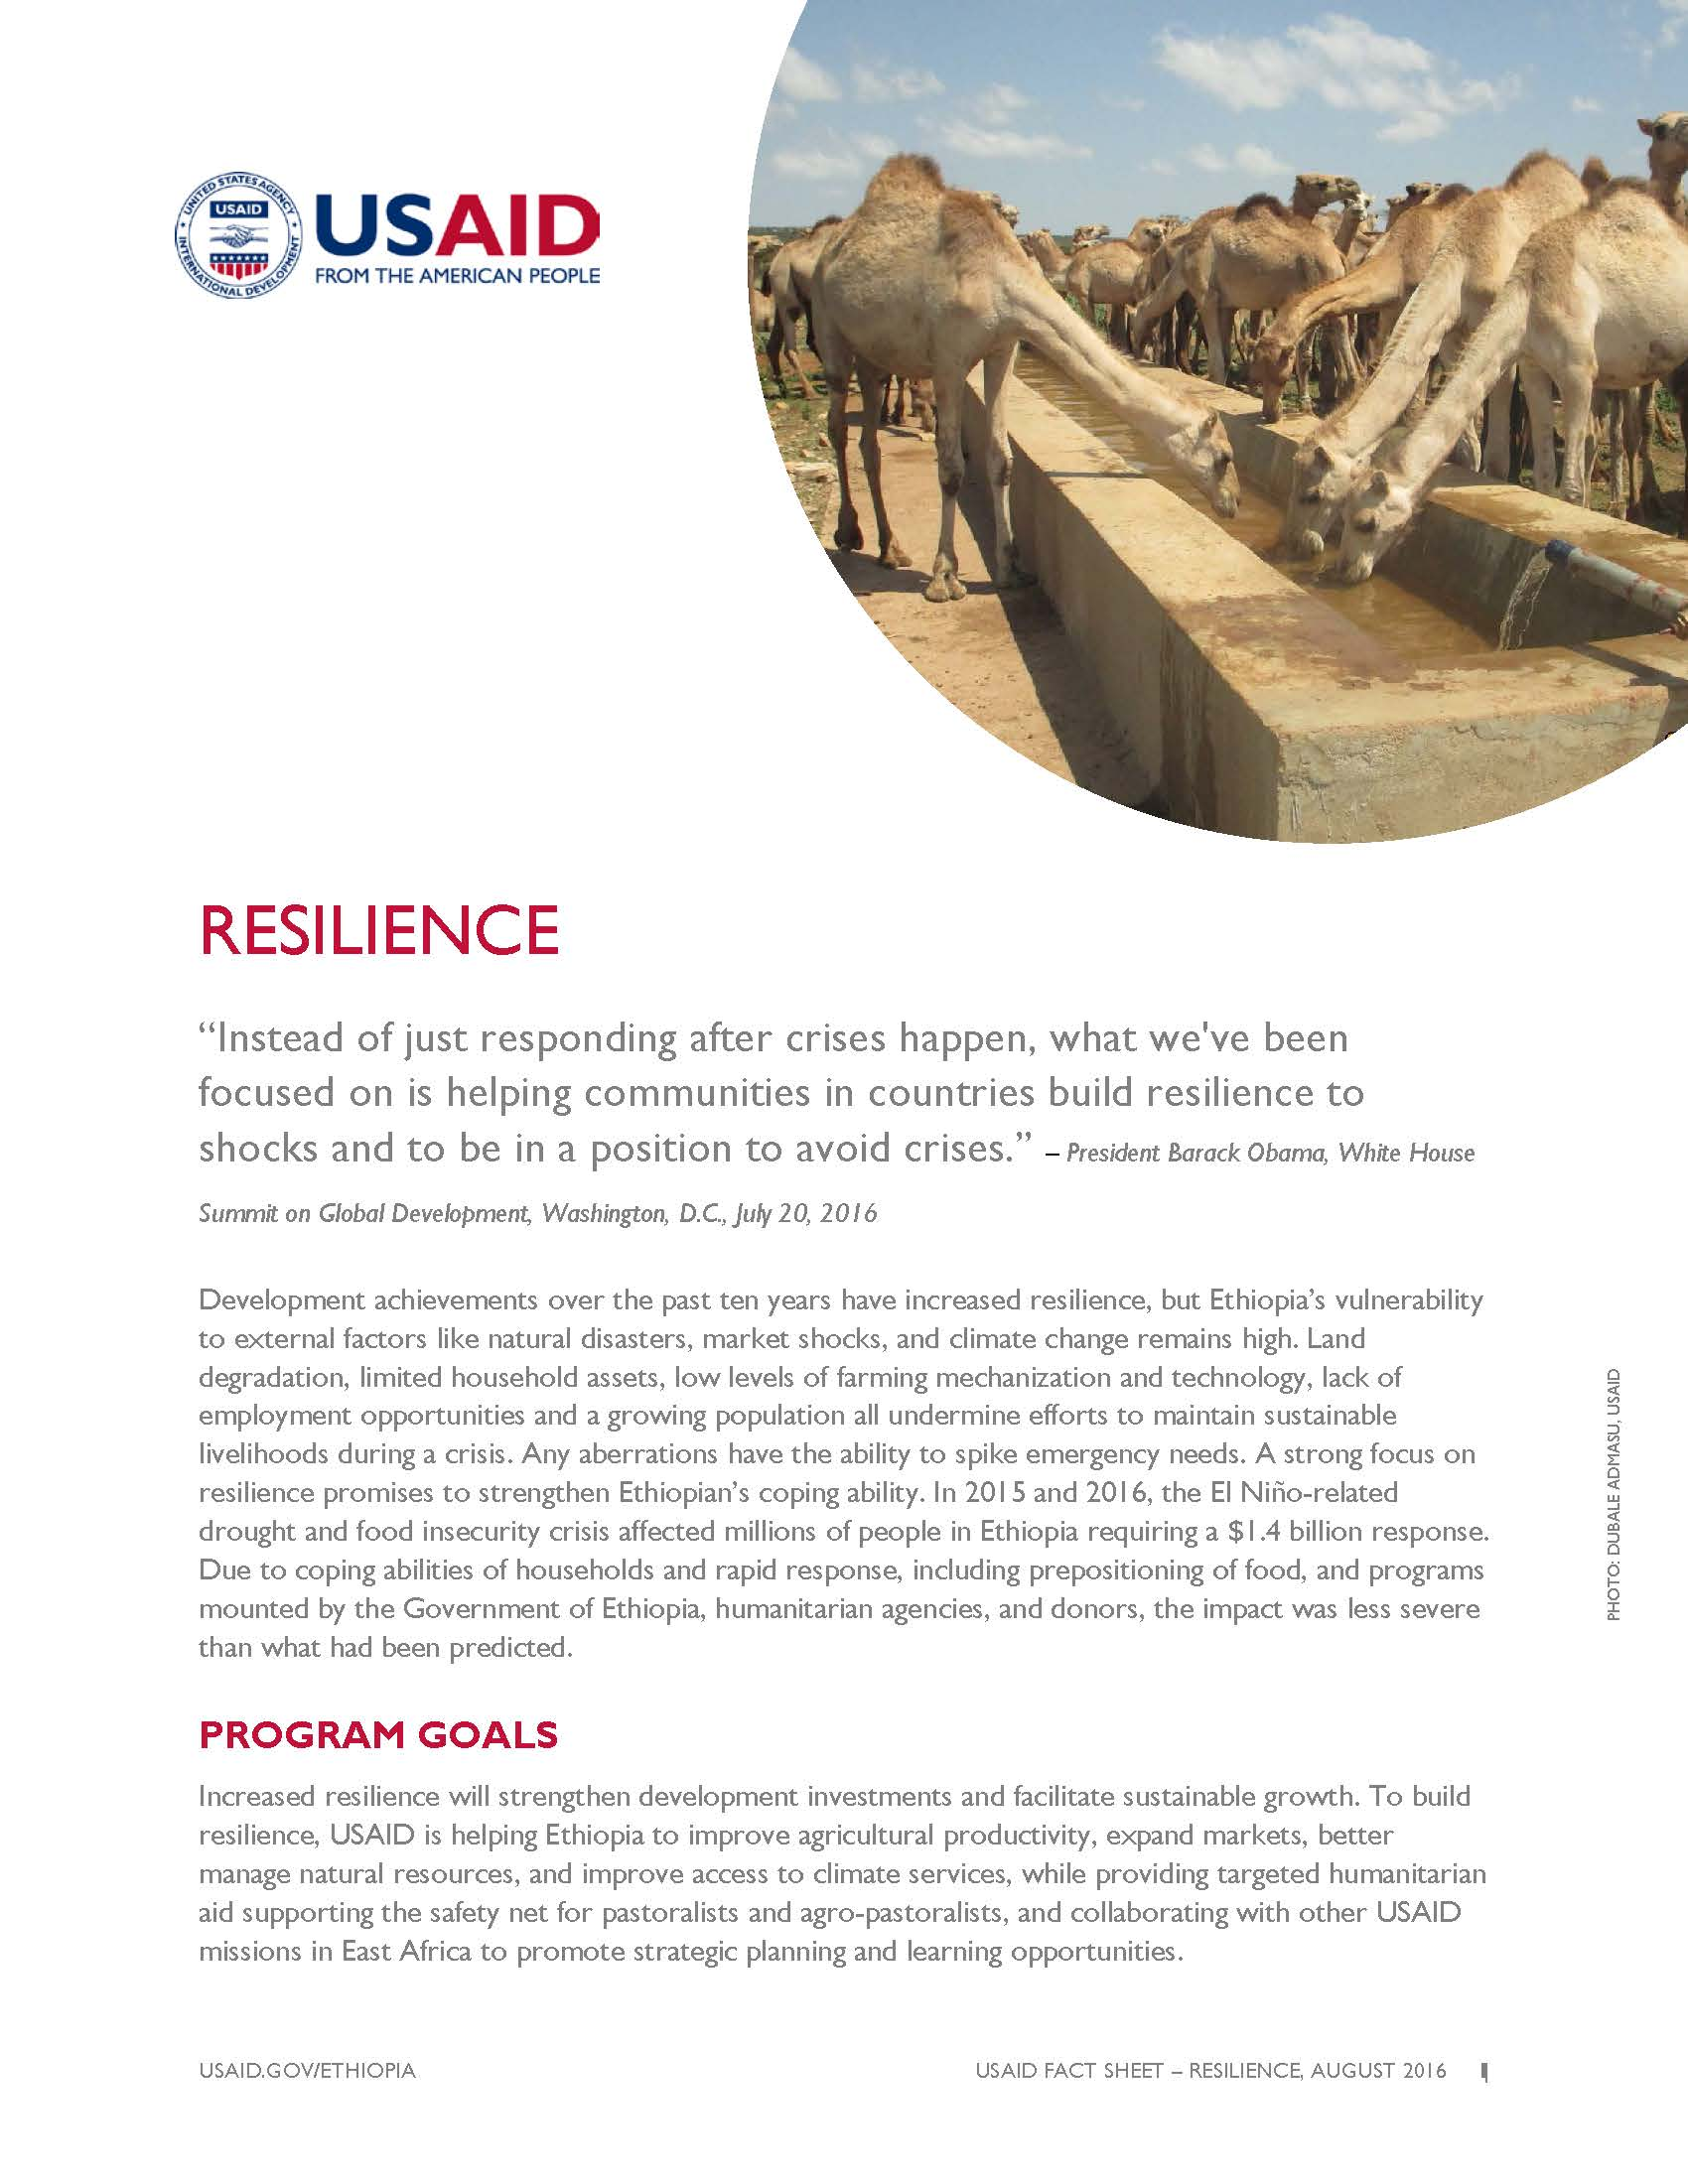 Ethiopia Resilence Fact Sheet